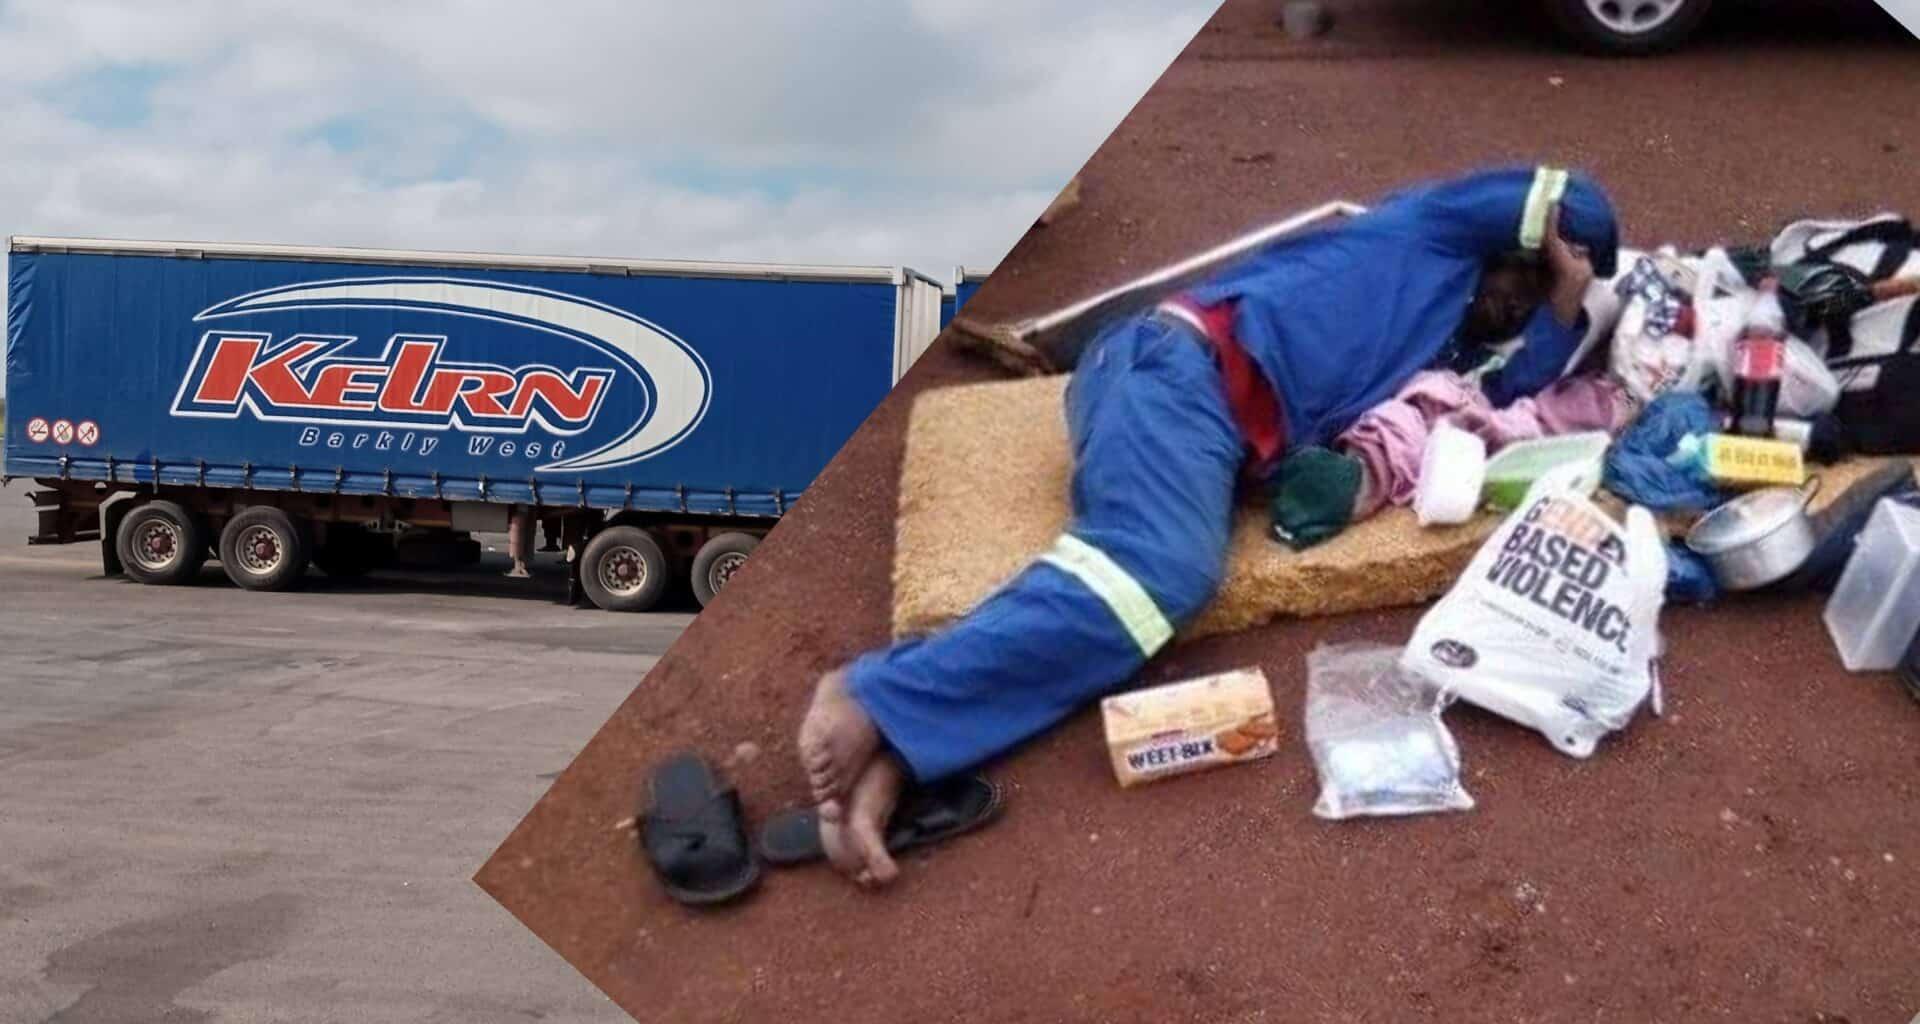 Amos Ndabeni kelrn Vervoer